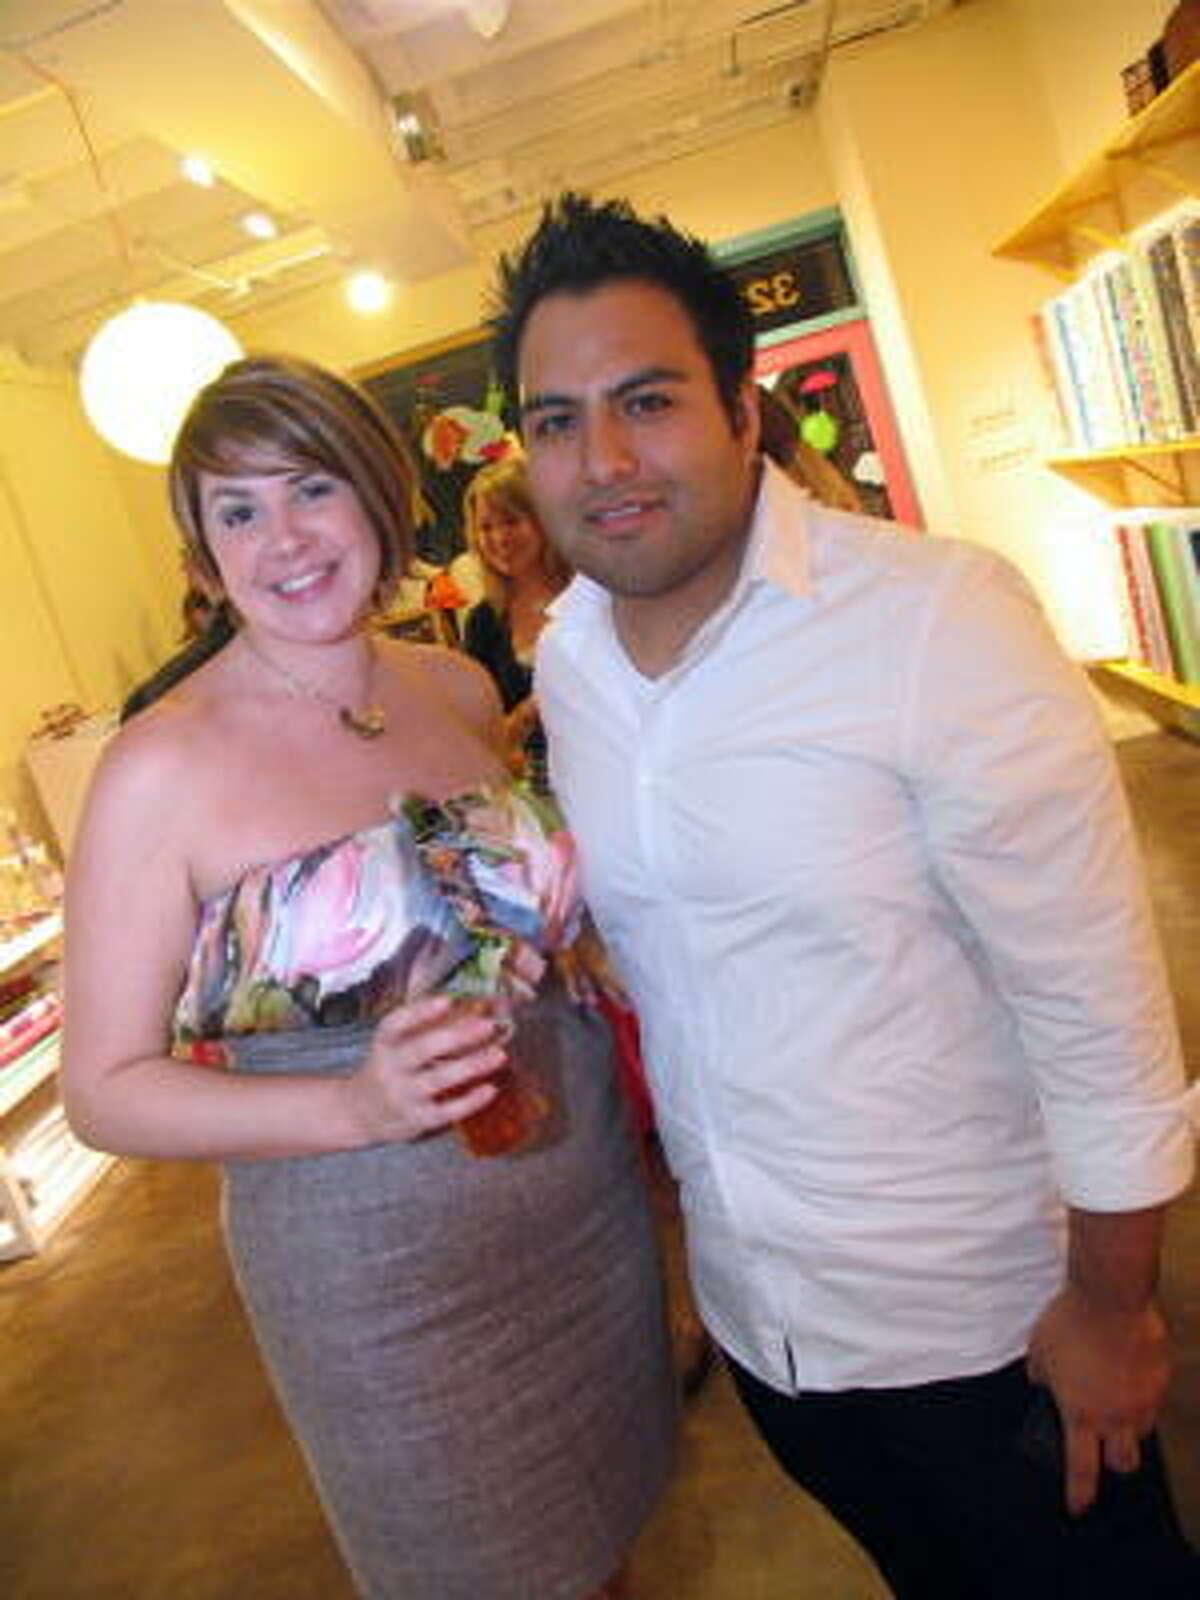 Monica Danna, left, and Carlos Gonzalez